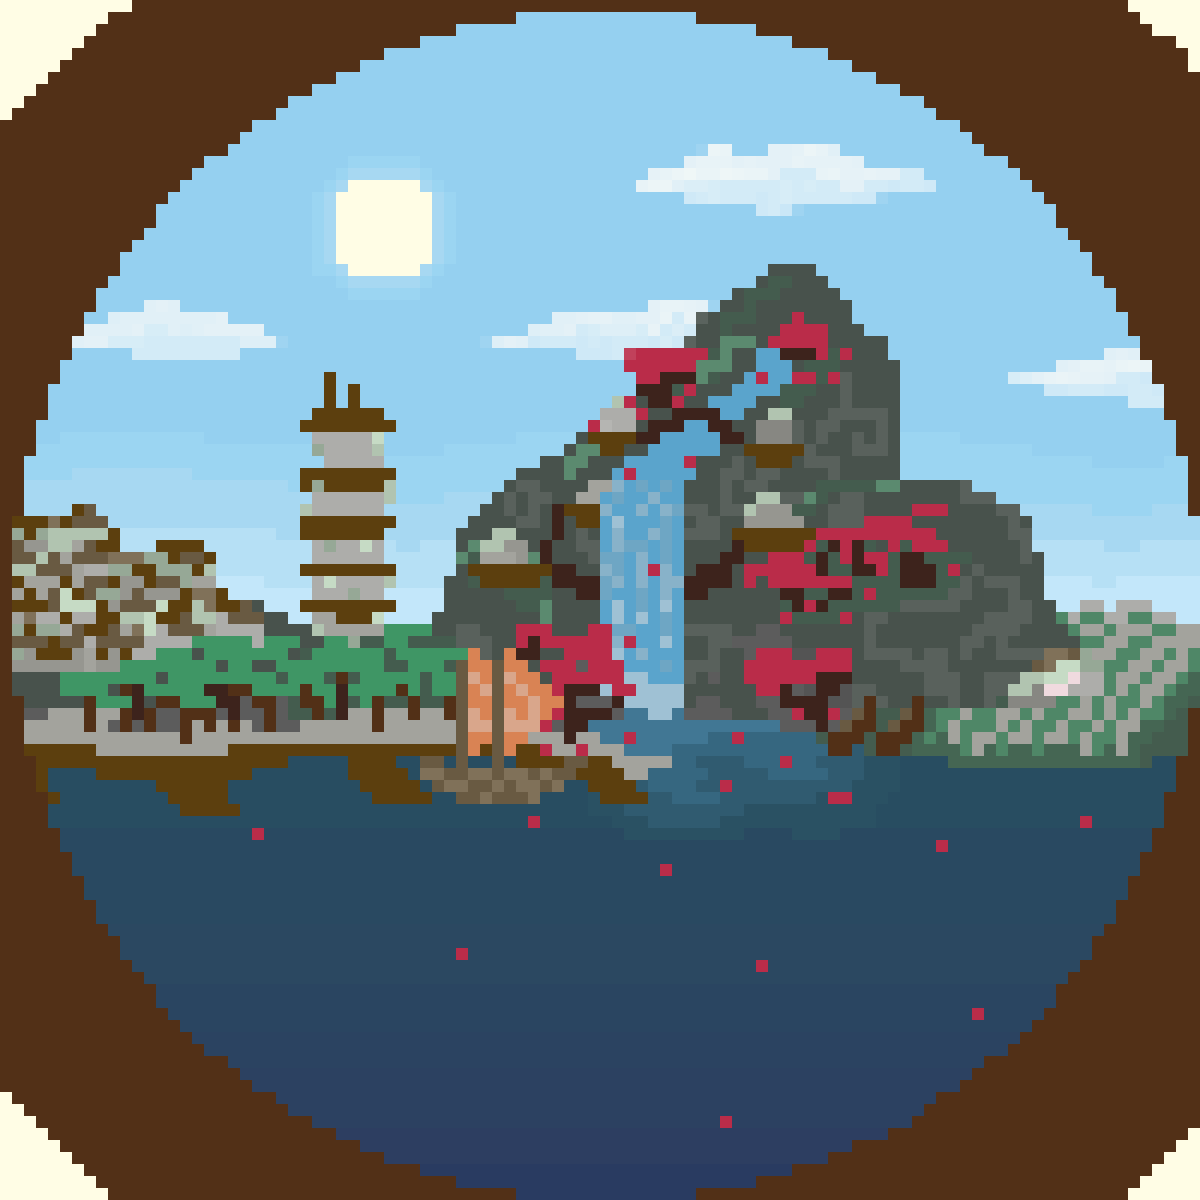 Island by Lucid